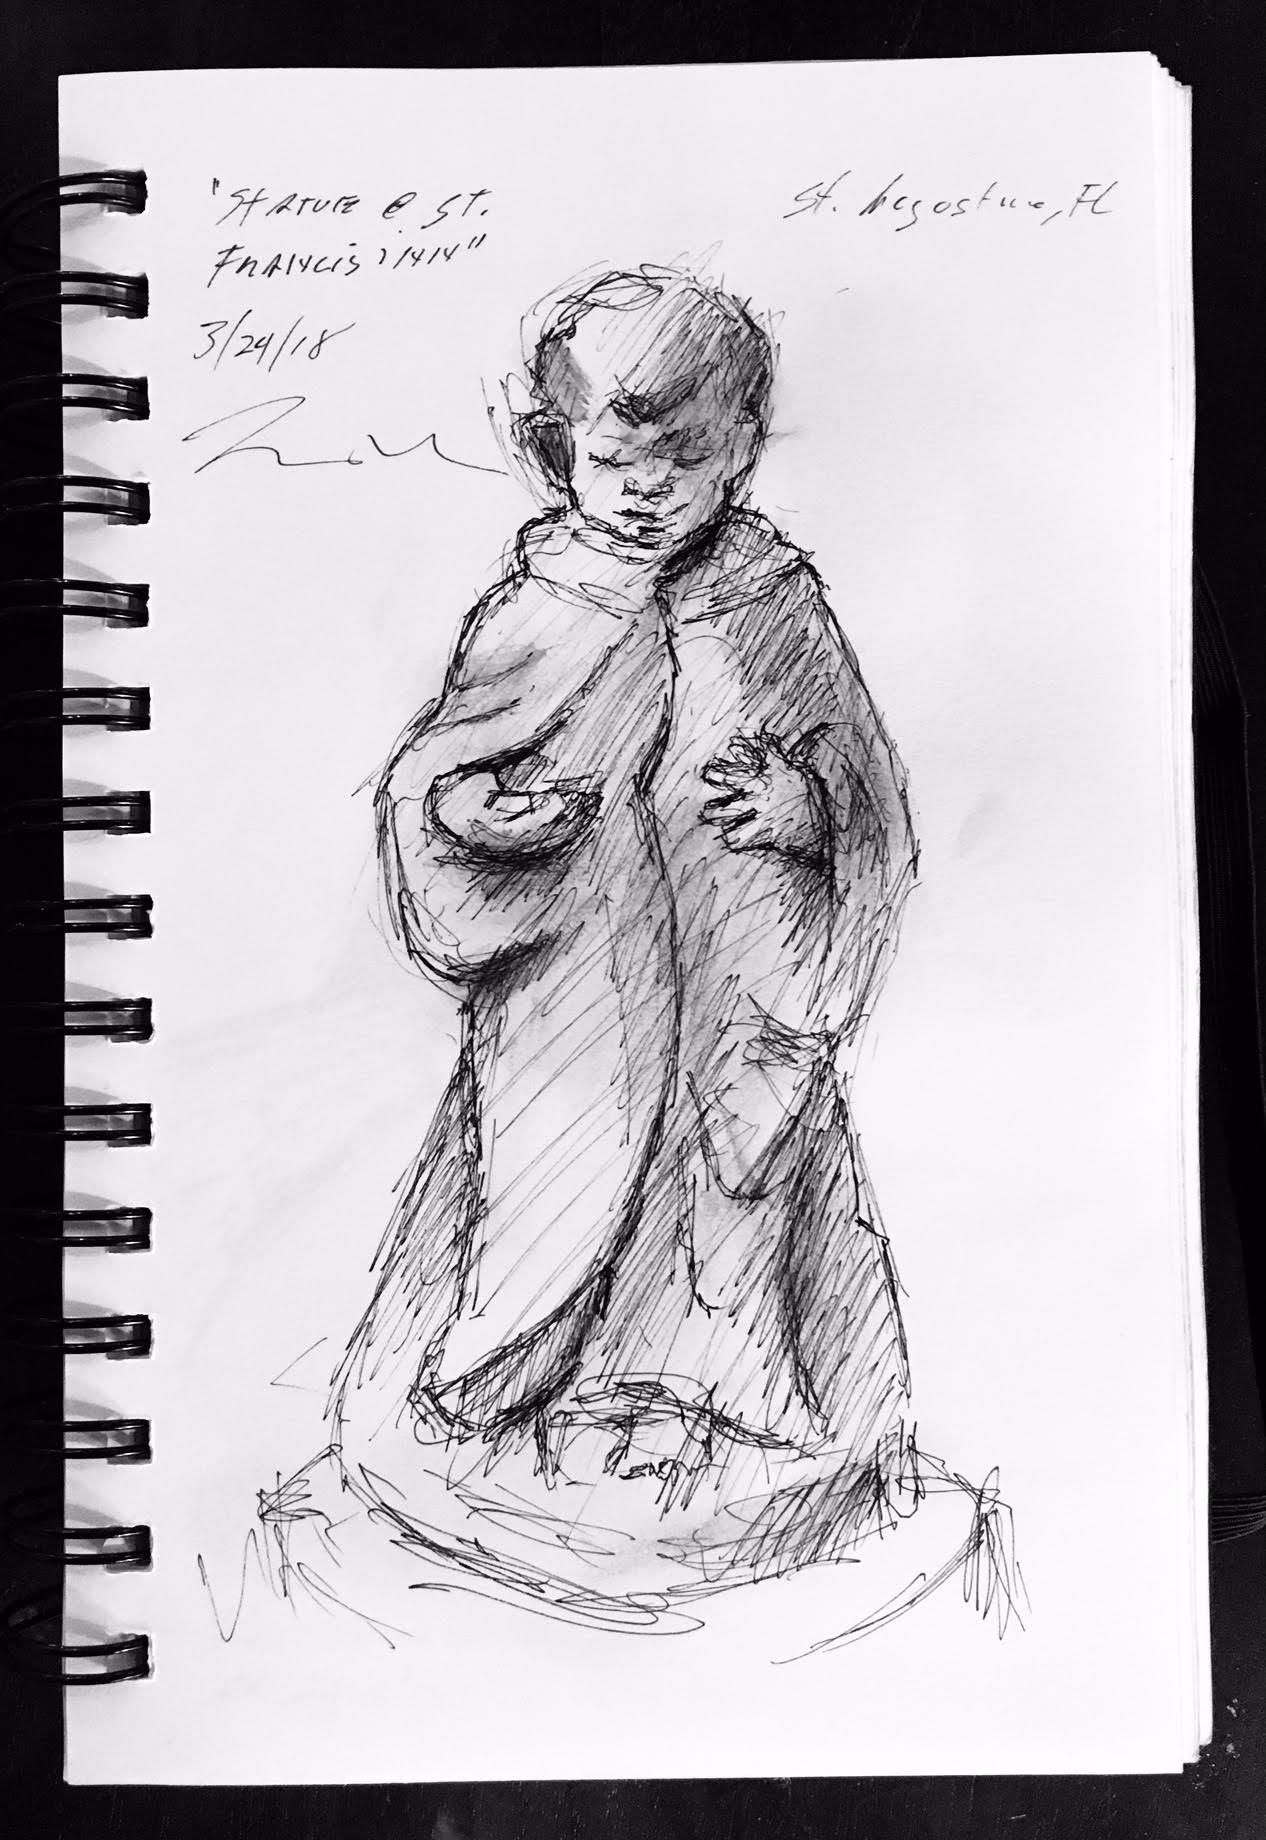 Demonstration Sketch by Brian Bomeisler